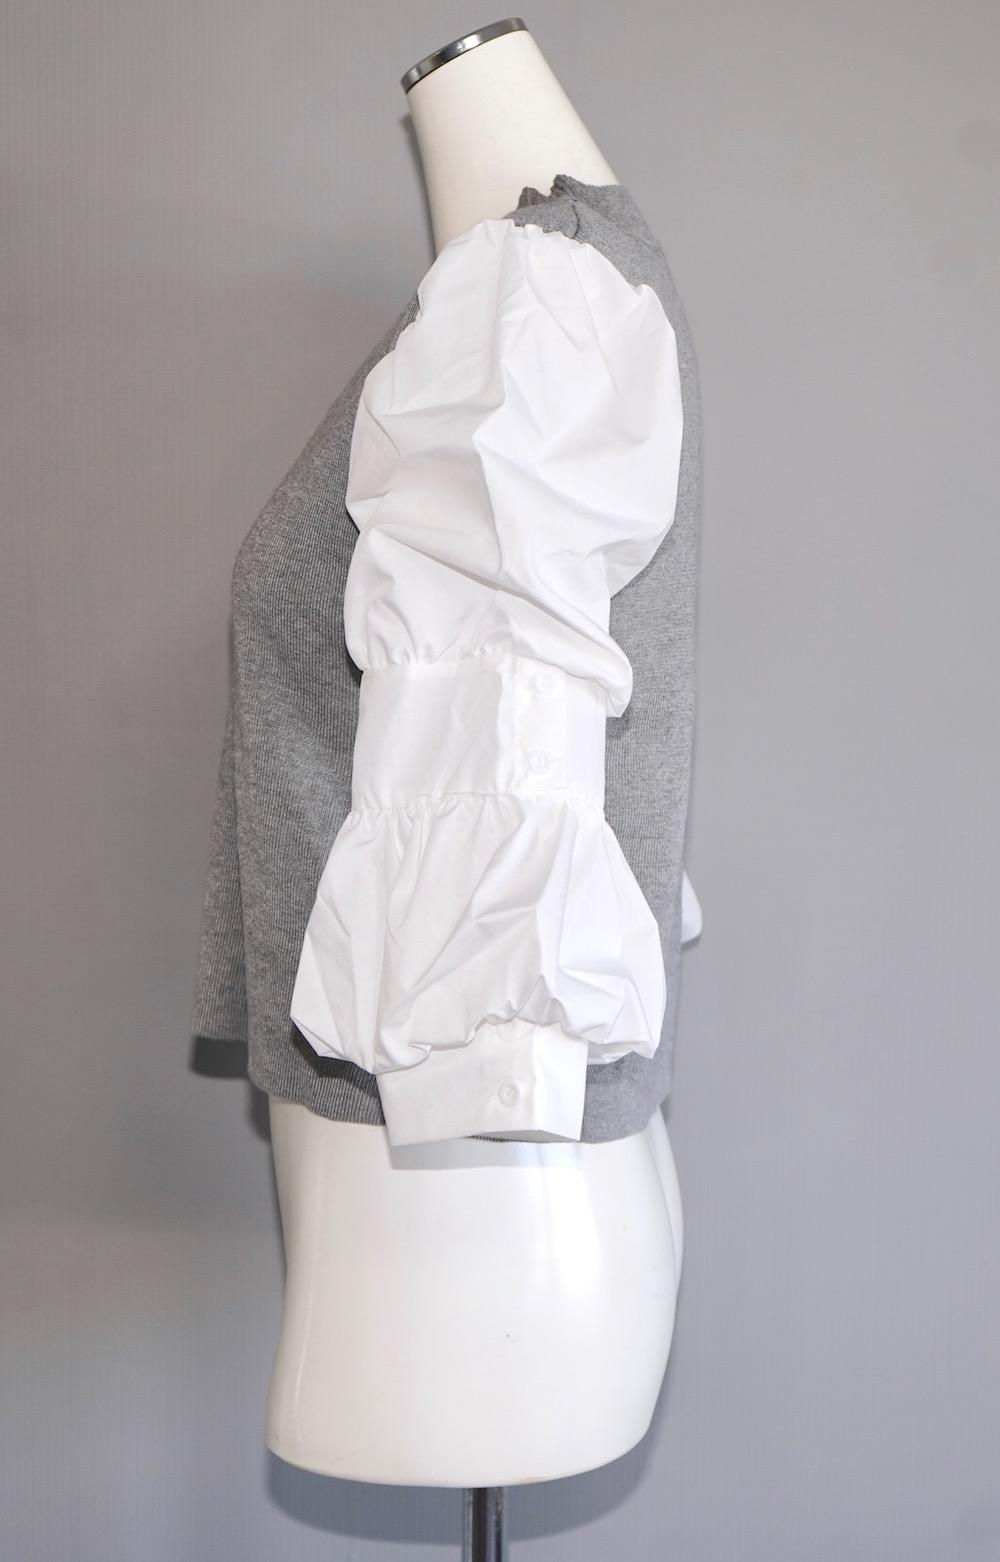 Puff Sleeve Blouse Docking Tops (light gray)